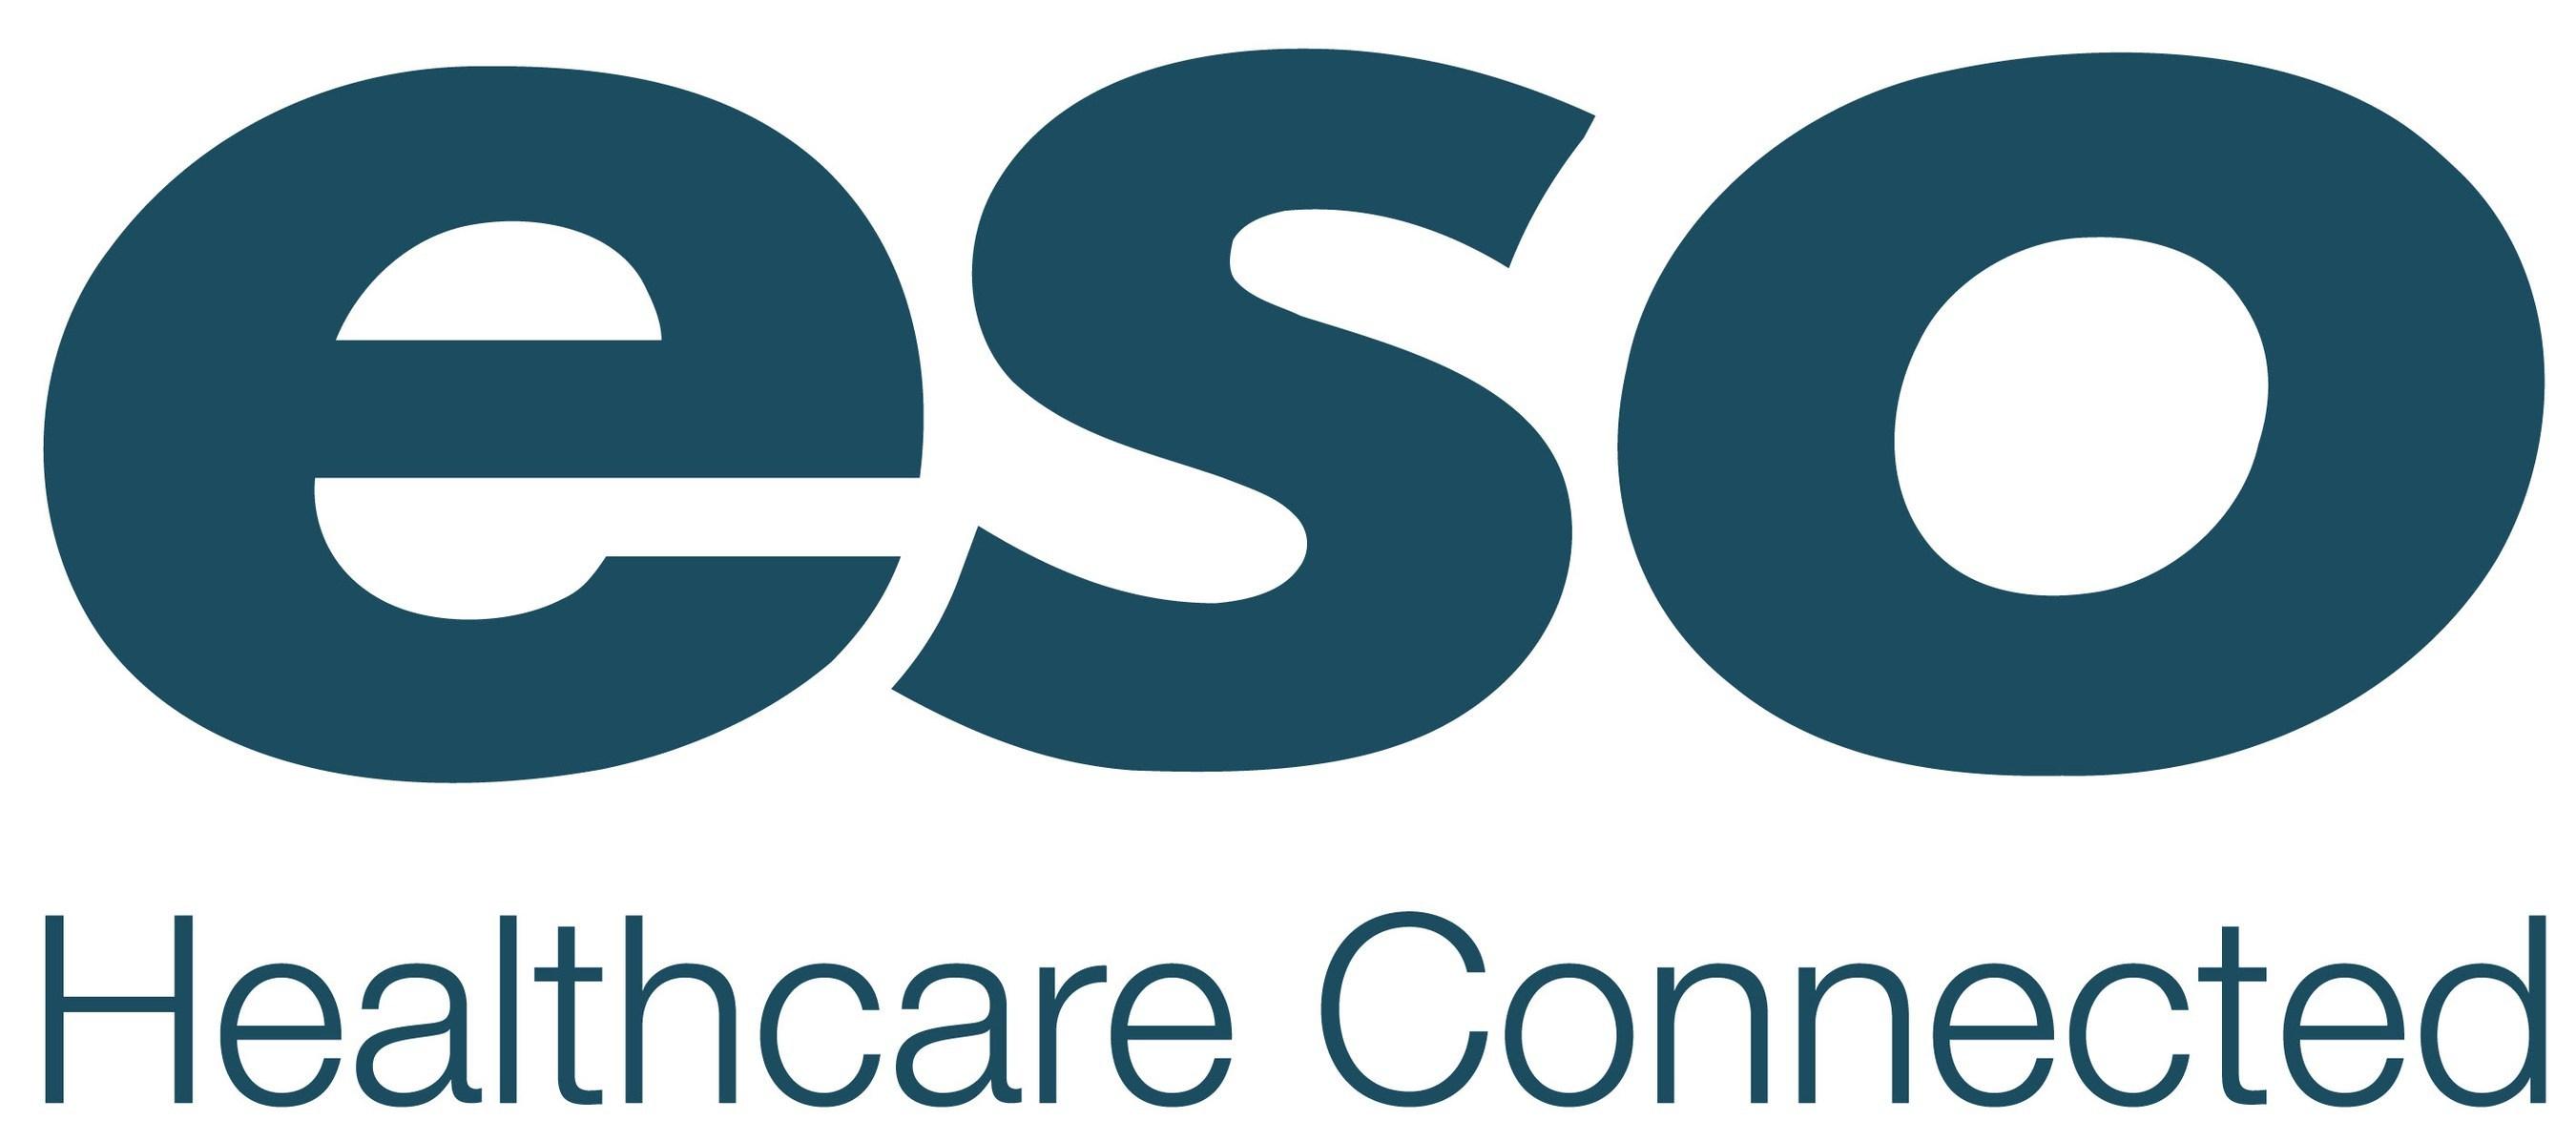 ESO Solutions, Inc. Logo (PRNewsfoto/ESO Solutions, Inc.)